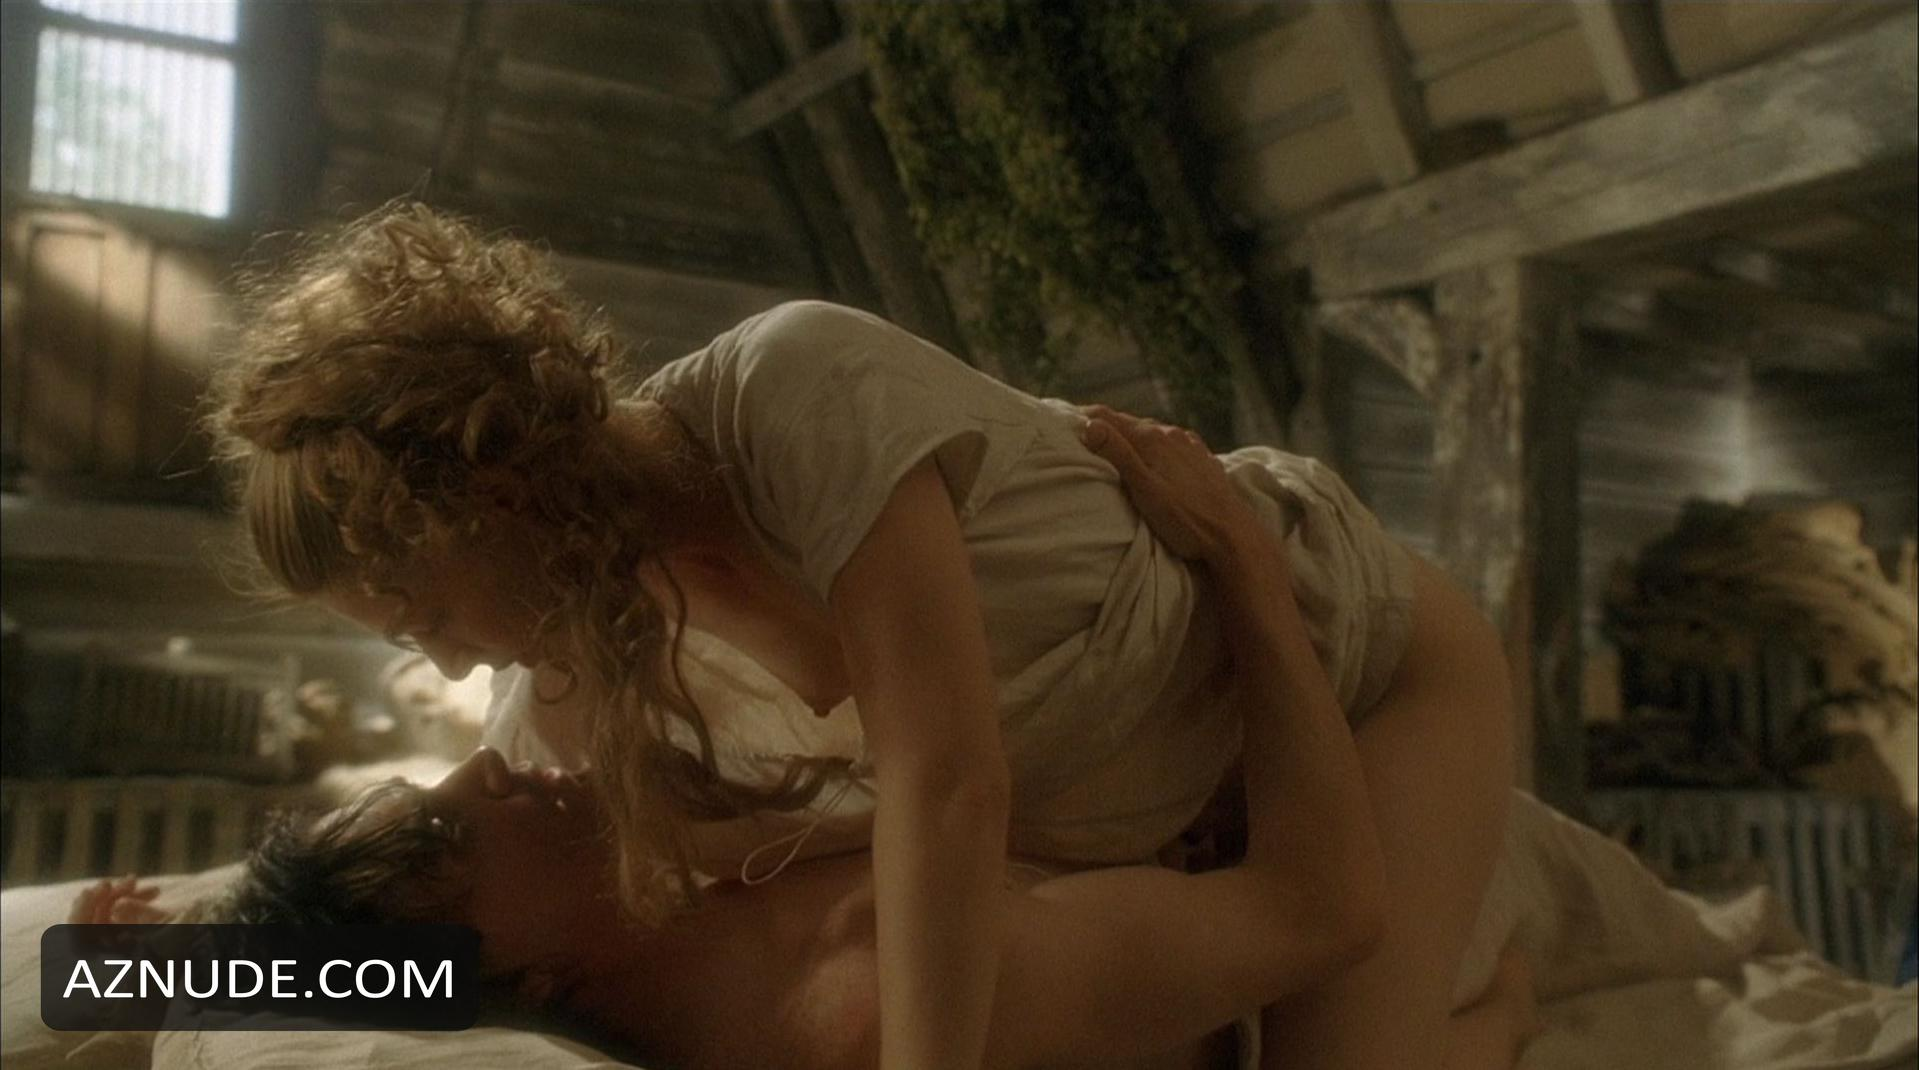 christine reyes sex video topless